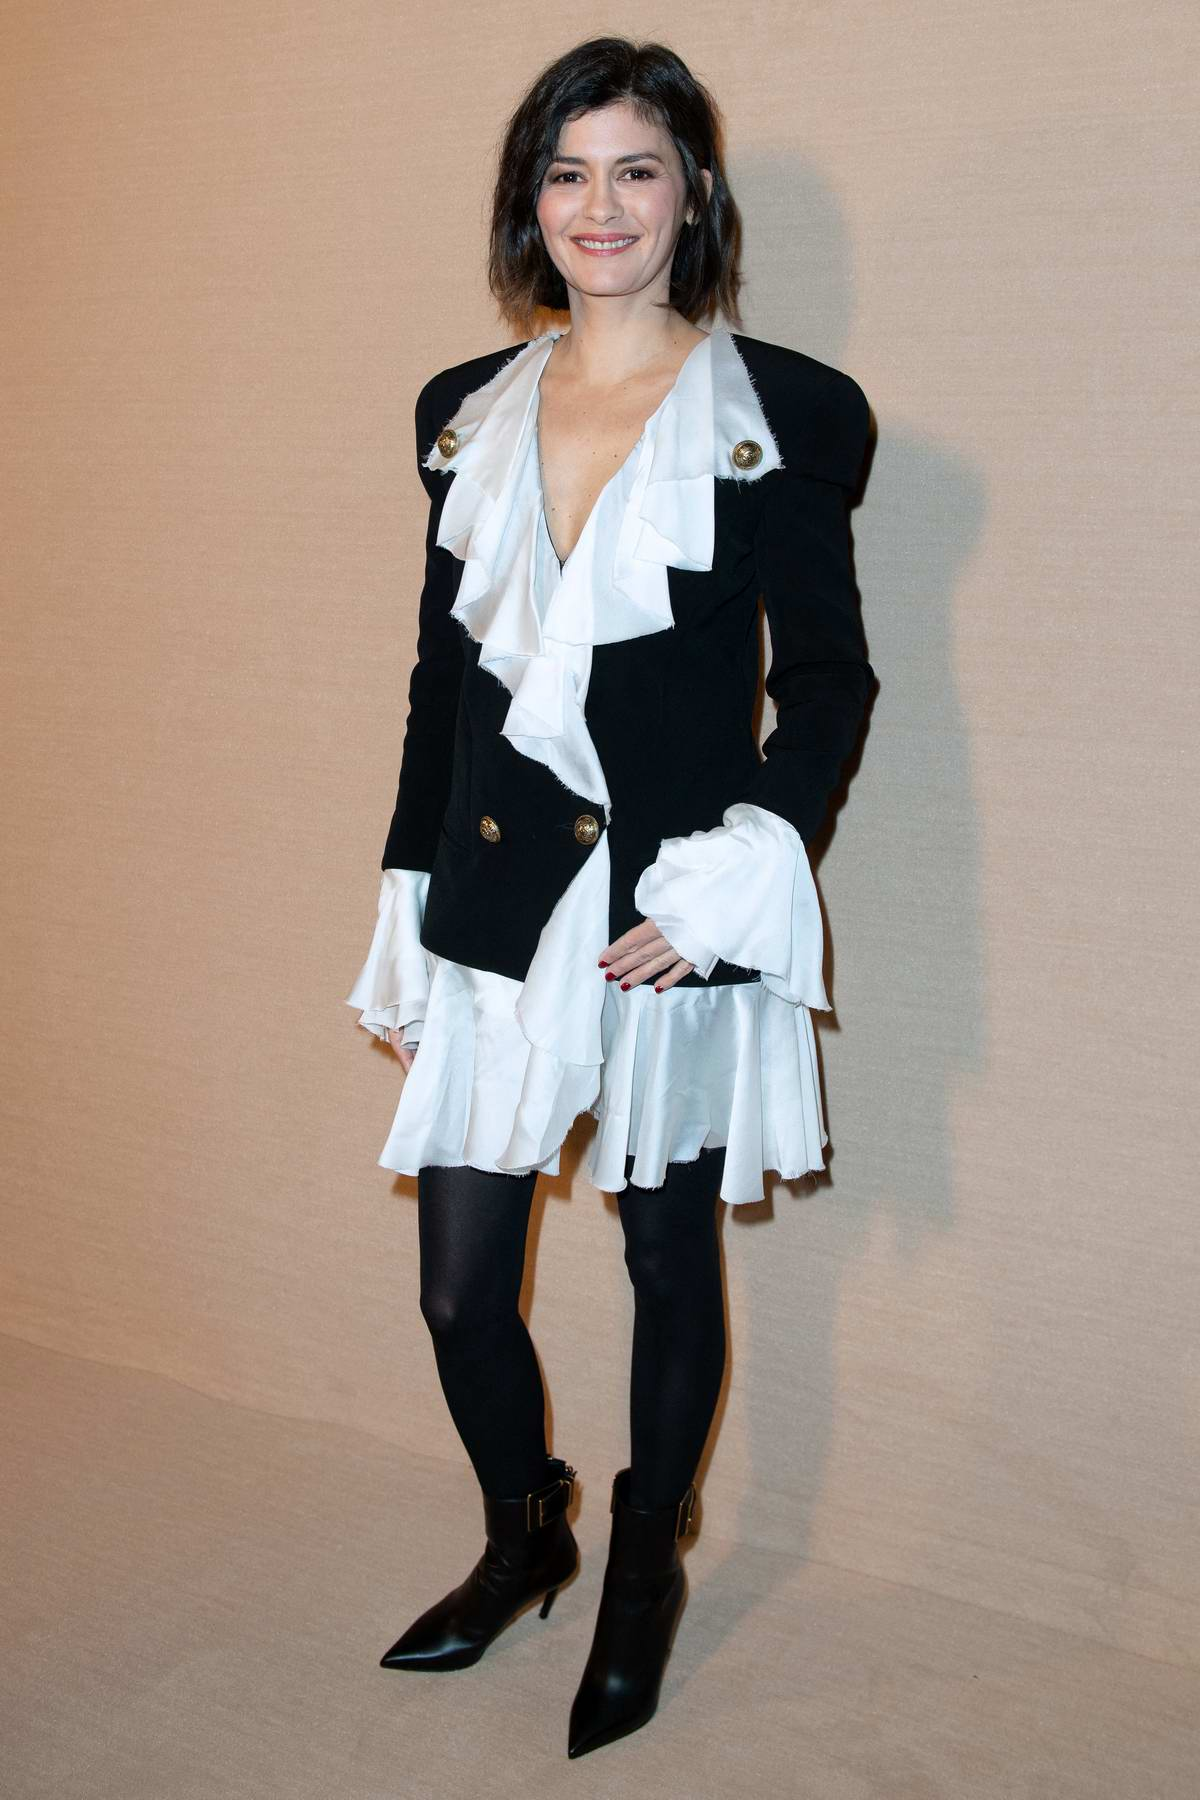 Audrey Tautou attends the Balmain show, F/W 2020 during Paris Fashion Week in Paris, France